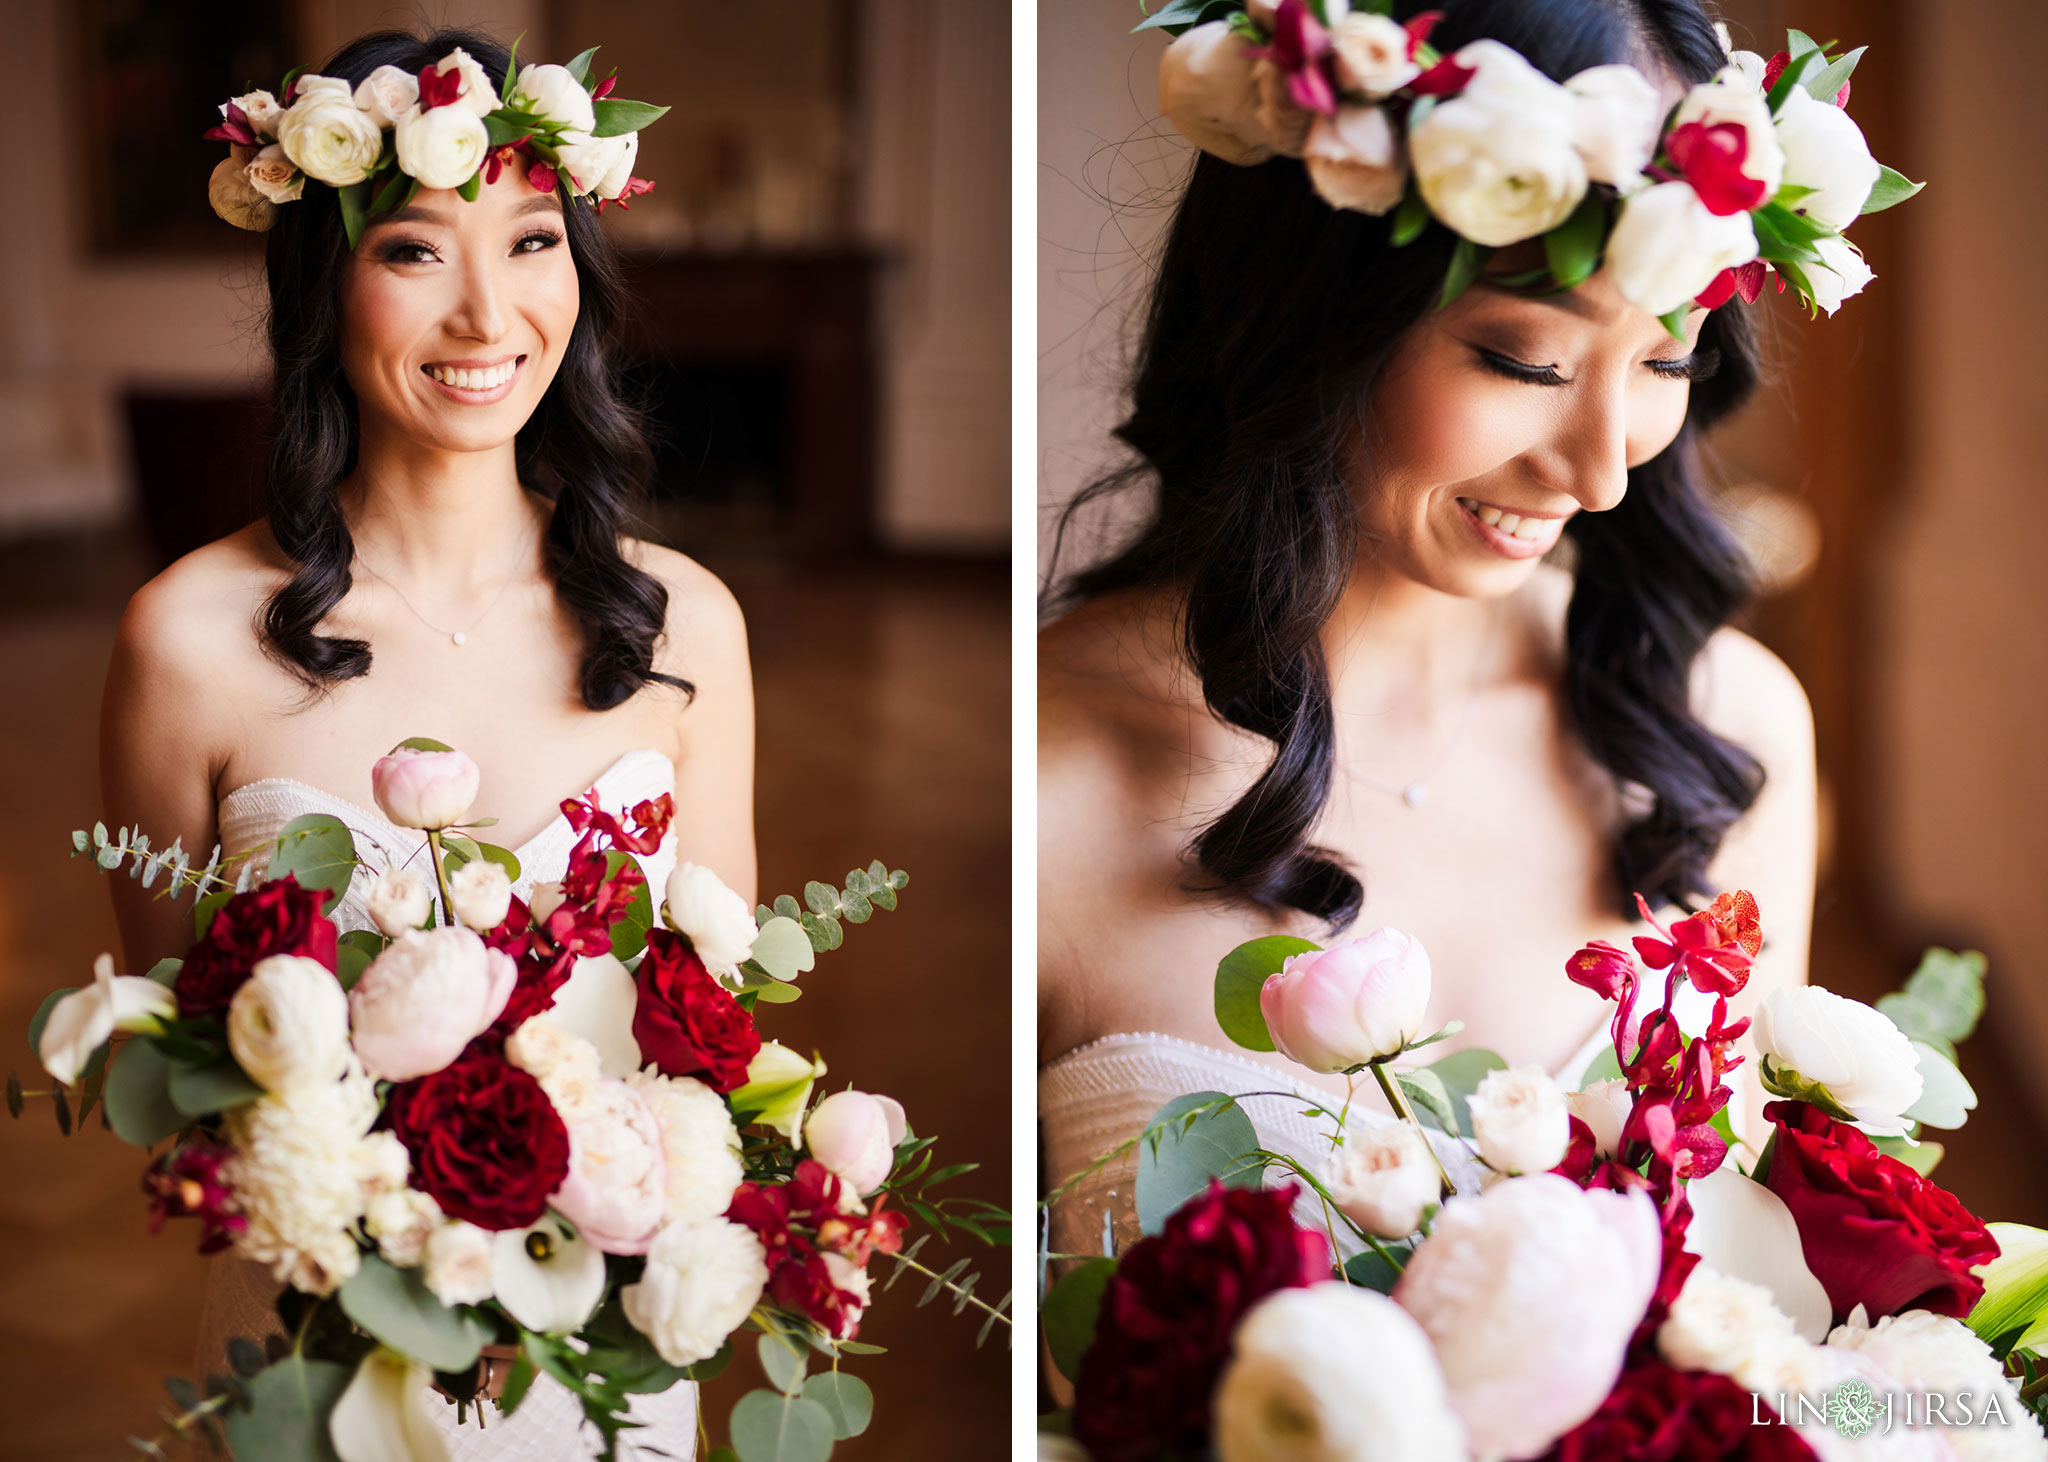 006 richard nixon library bride wedding photography